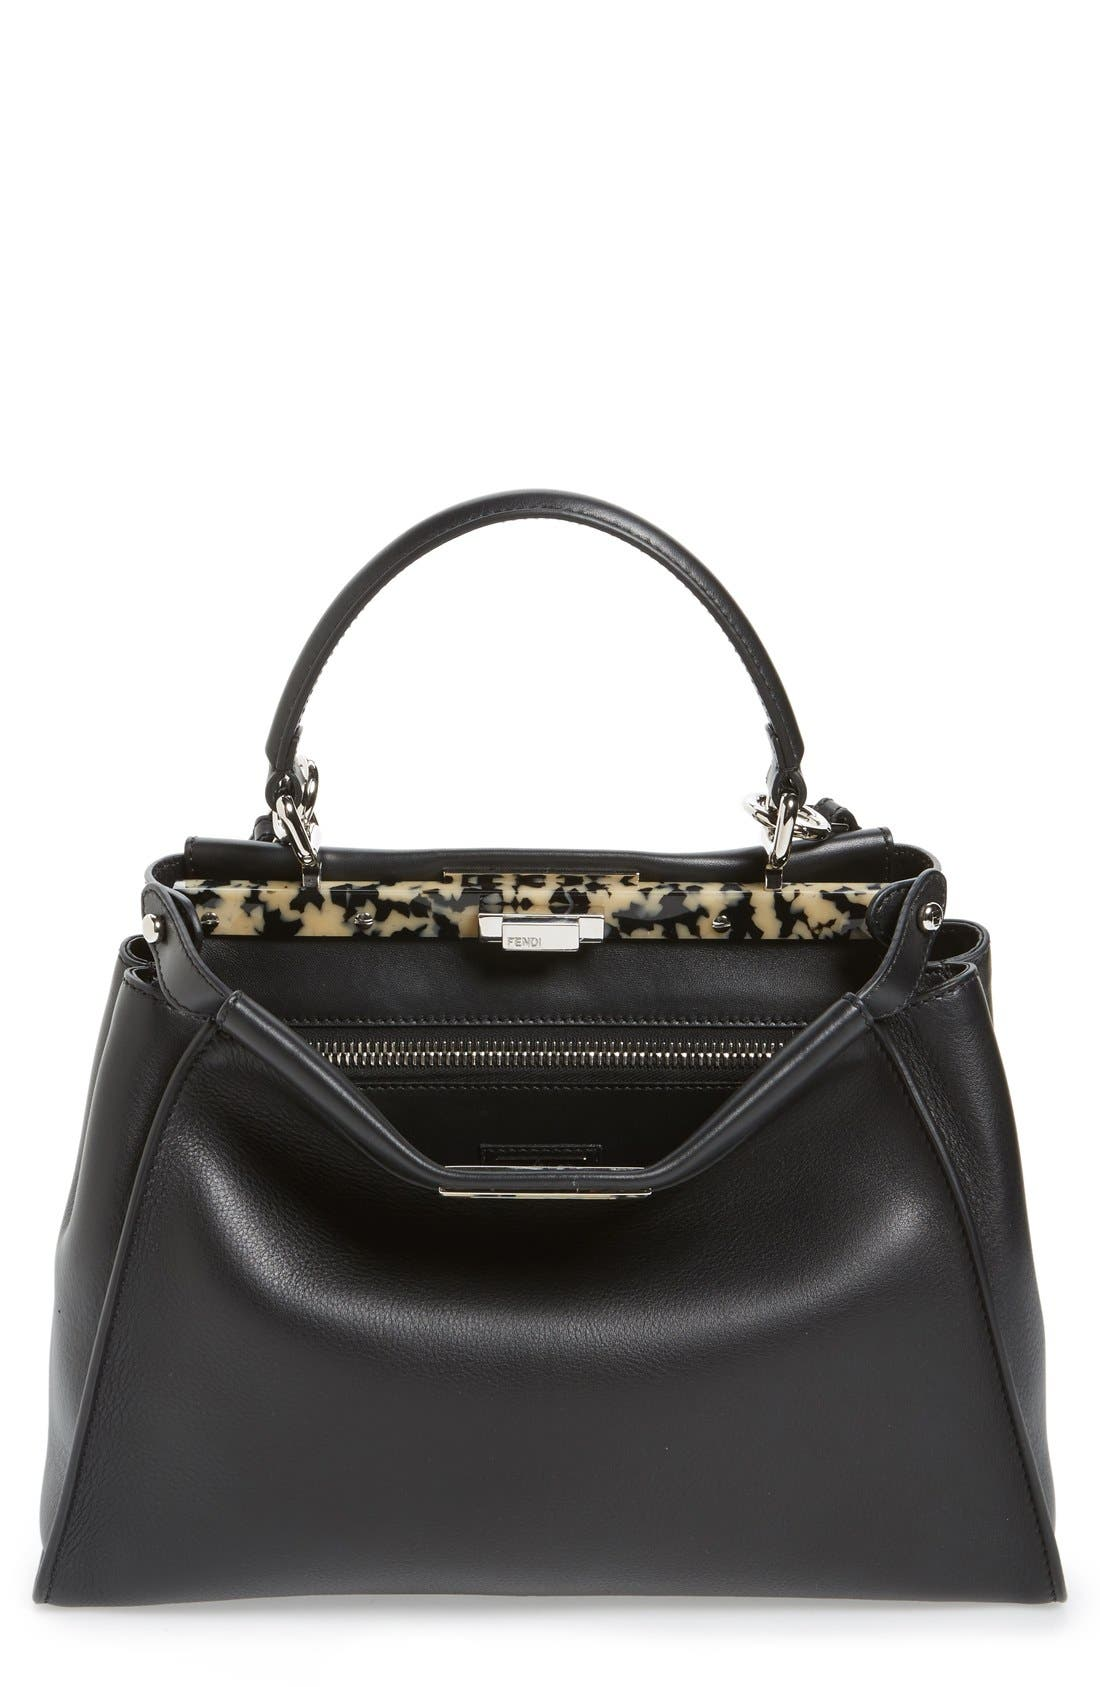 Fendi 'Peekaboo' Leather Satchel with Plexiglas® Trim